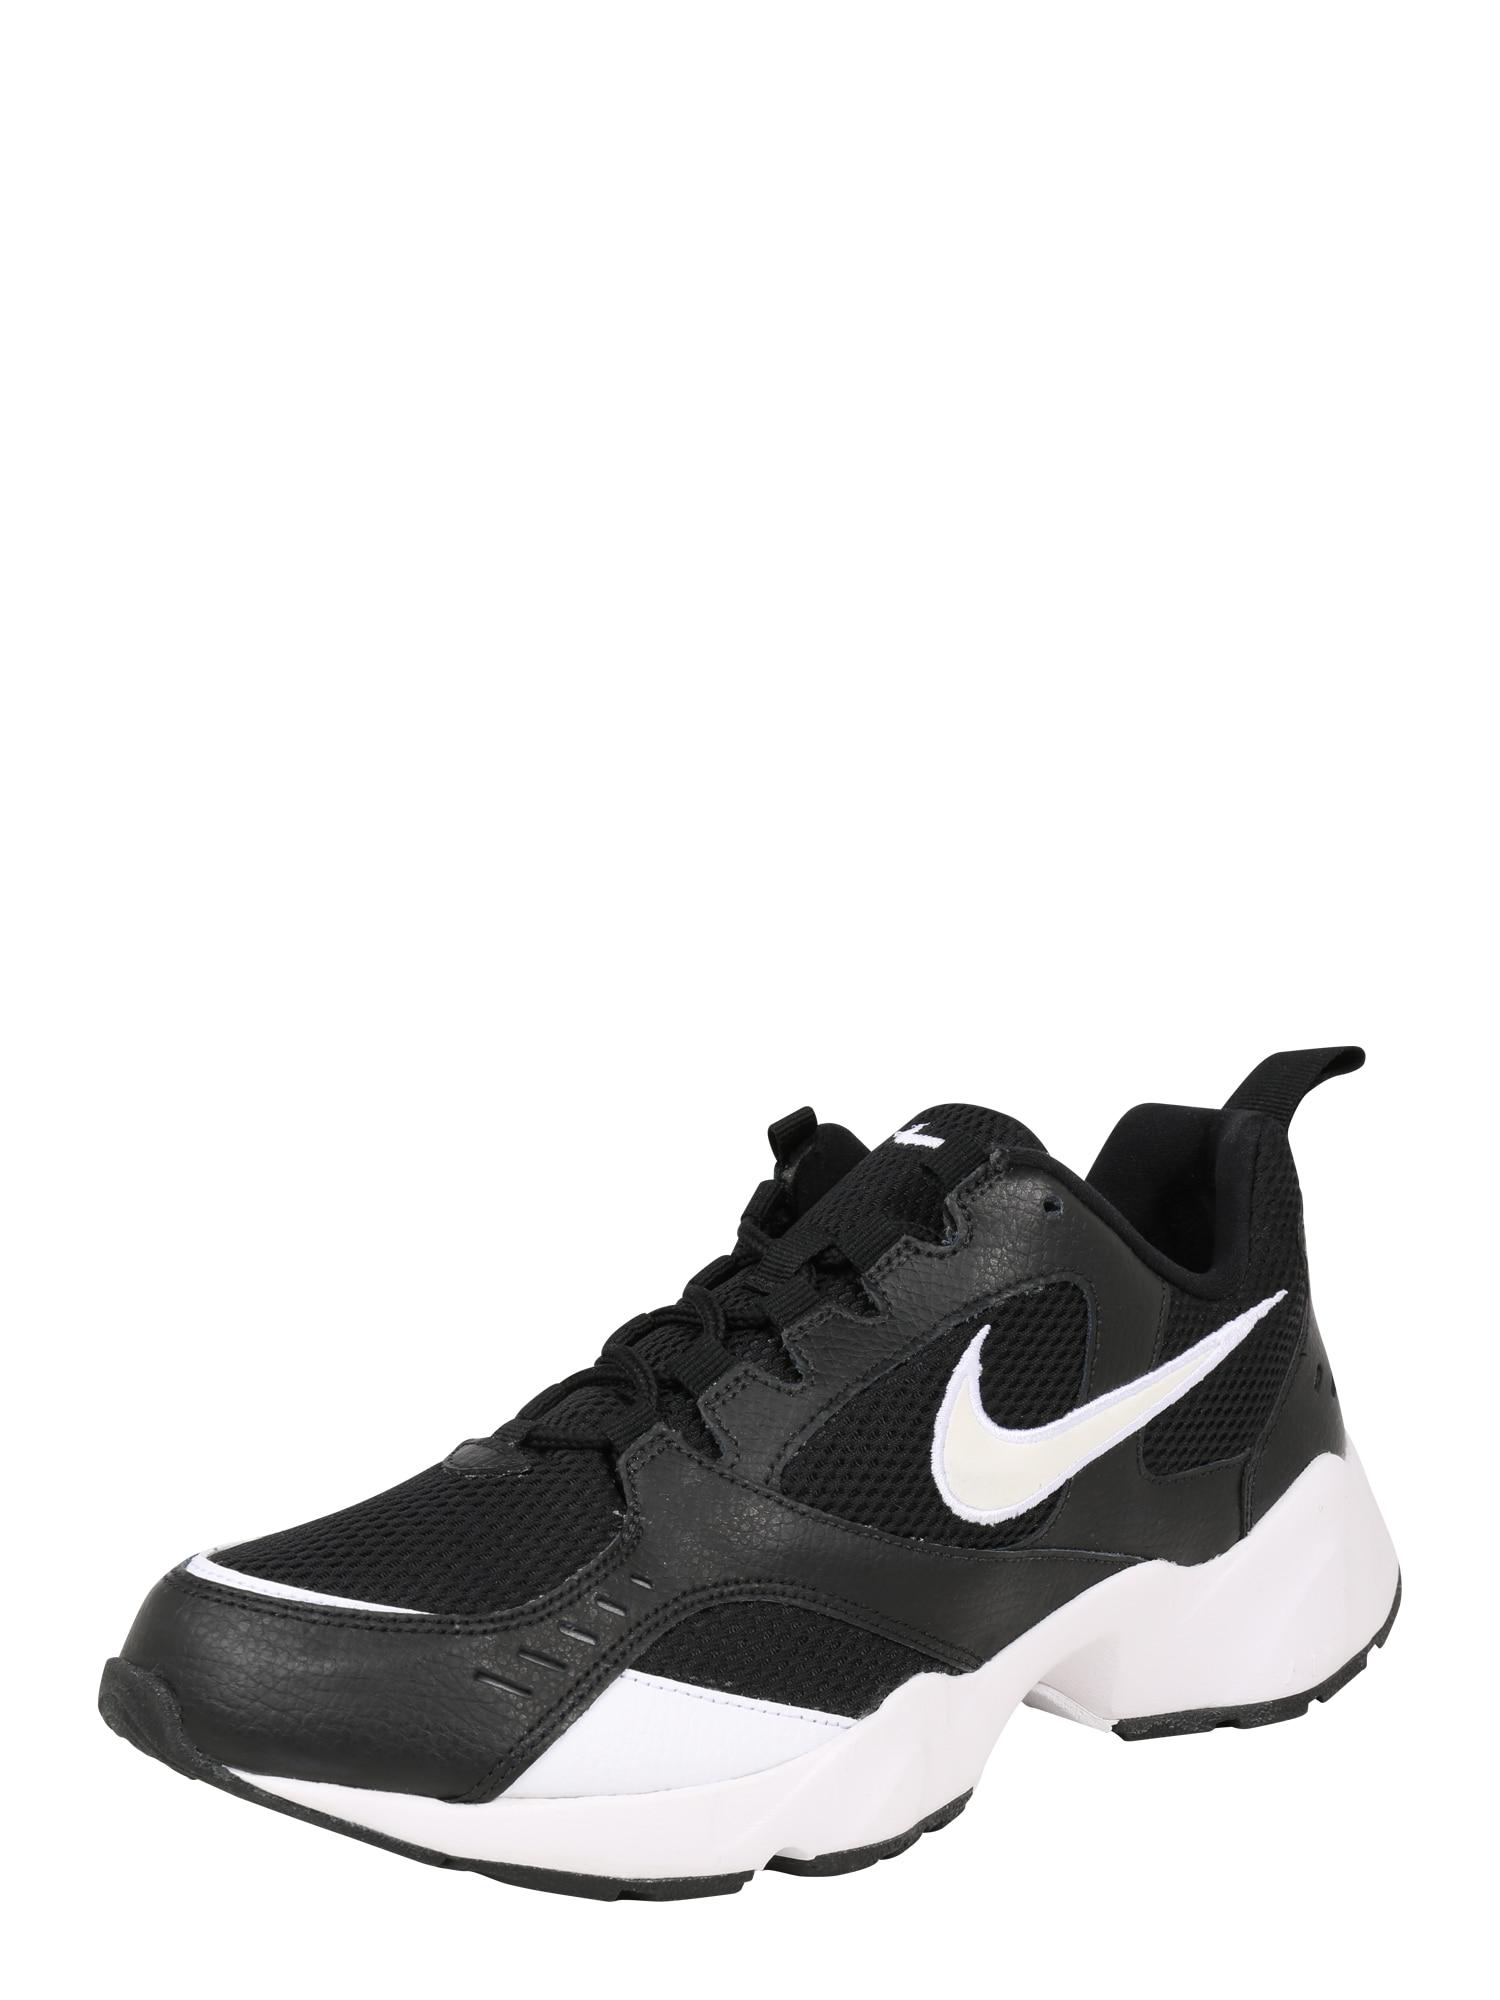 Nike Sportswear Bėgimo batai 'NIKE AIR HEIGHTS' juoda / balta